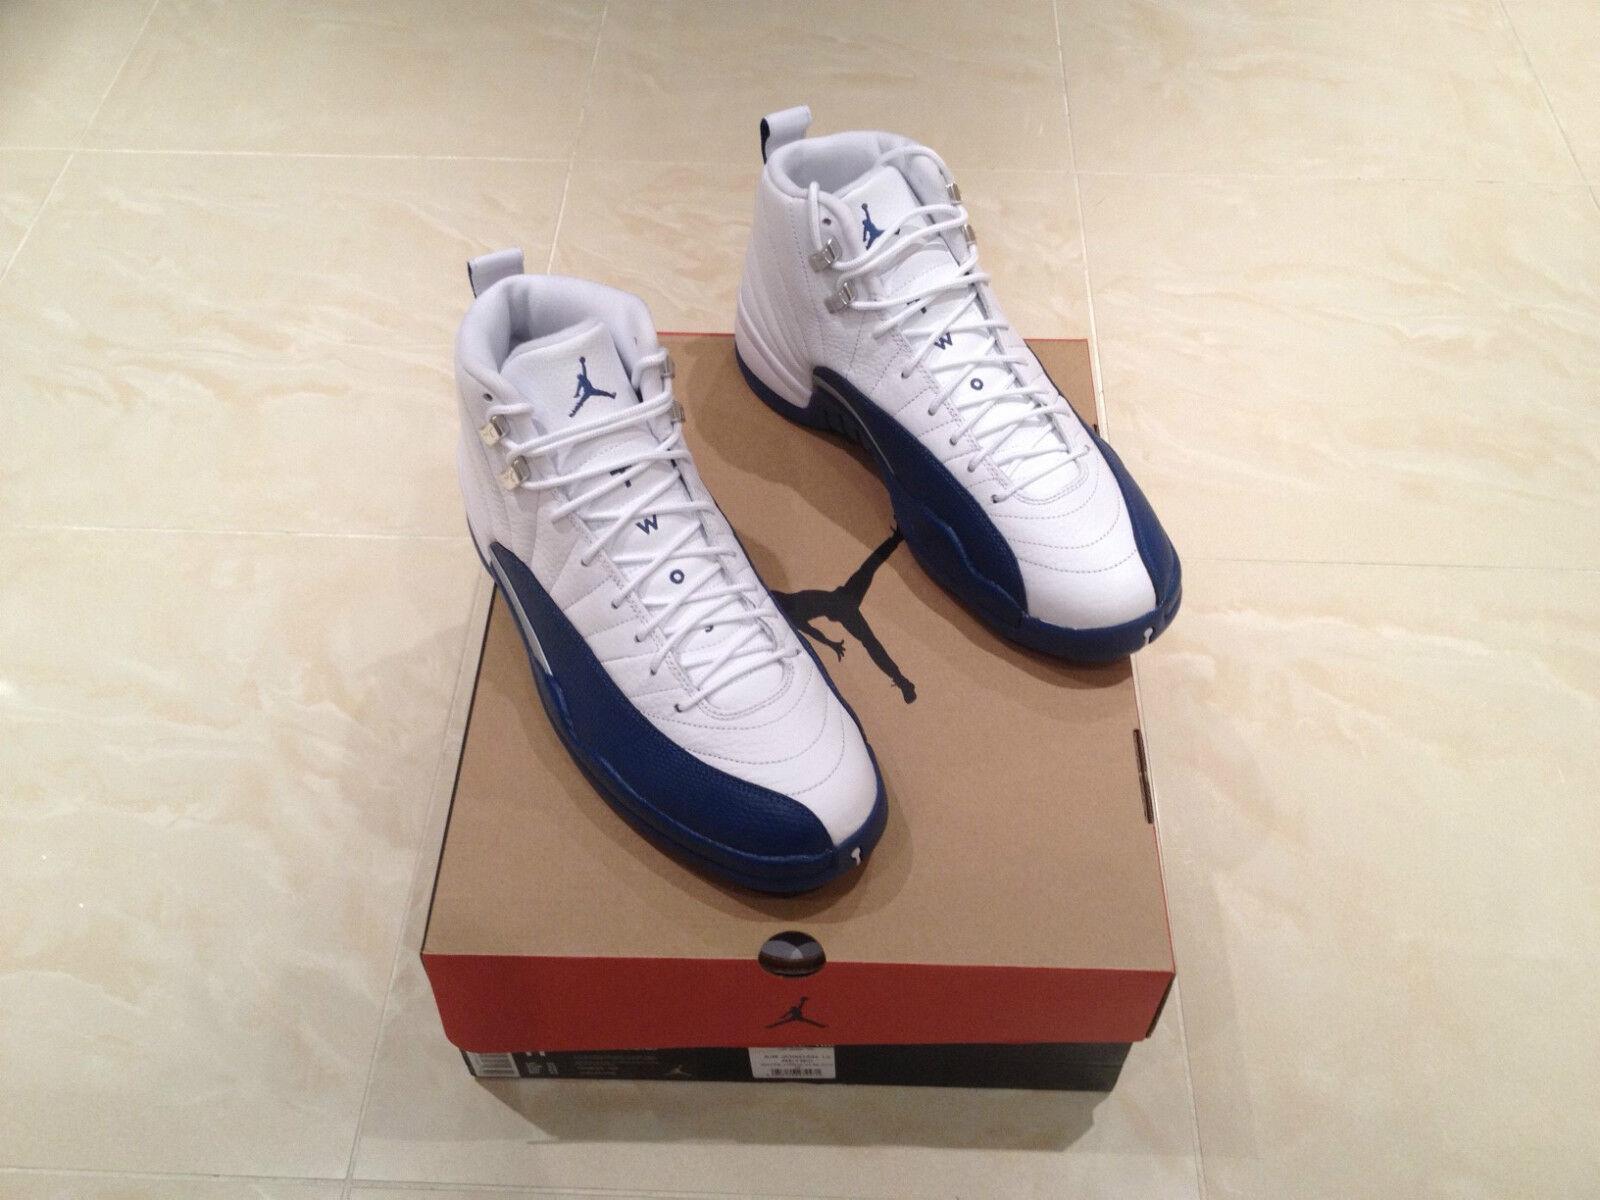 2016 Nike Air Jordan 12 12 12 XII Francese Blu Retro Tutte le Taglie 6-9 NUOVO 6 7 8 9 9033de